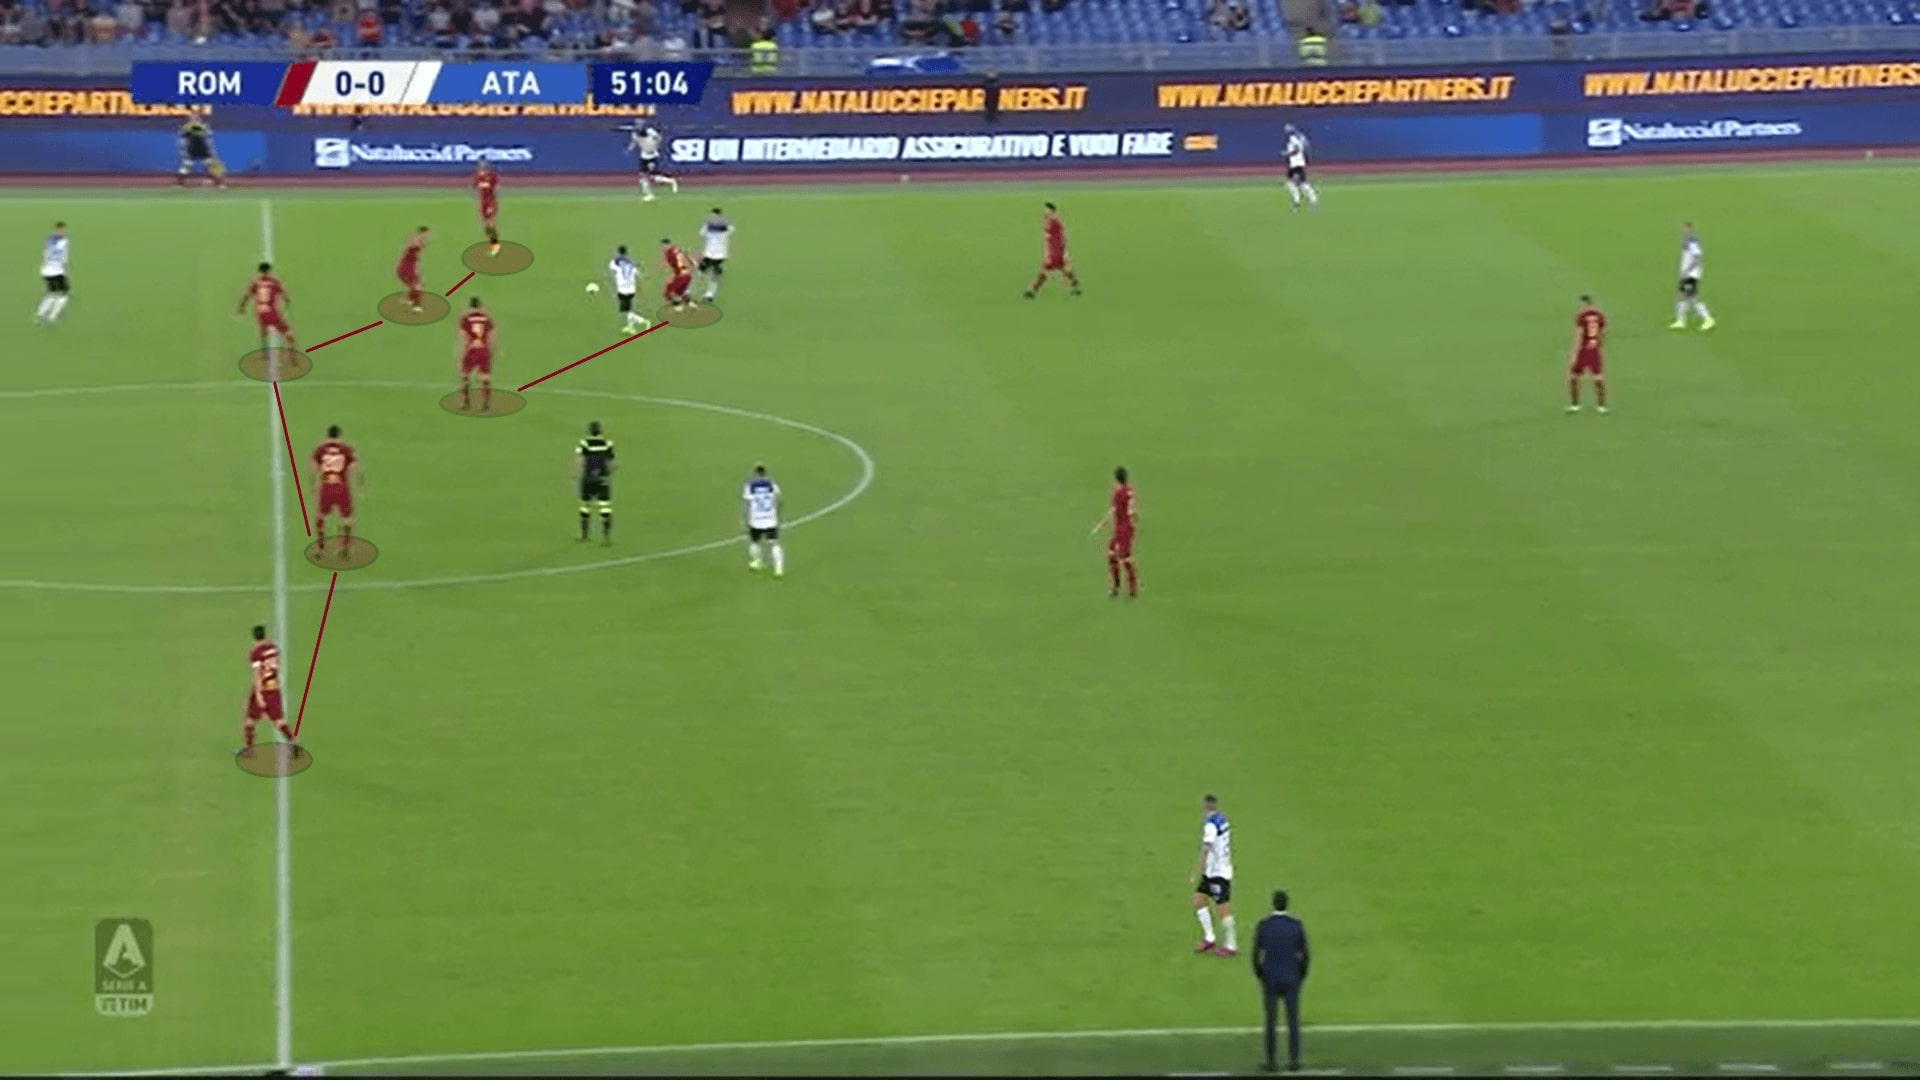 Serie A 2019/20: Roma vs Atalanta - tactical analysis tactics